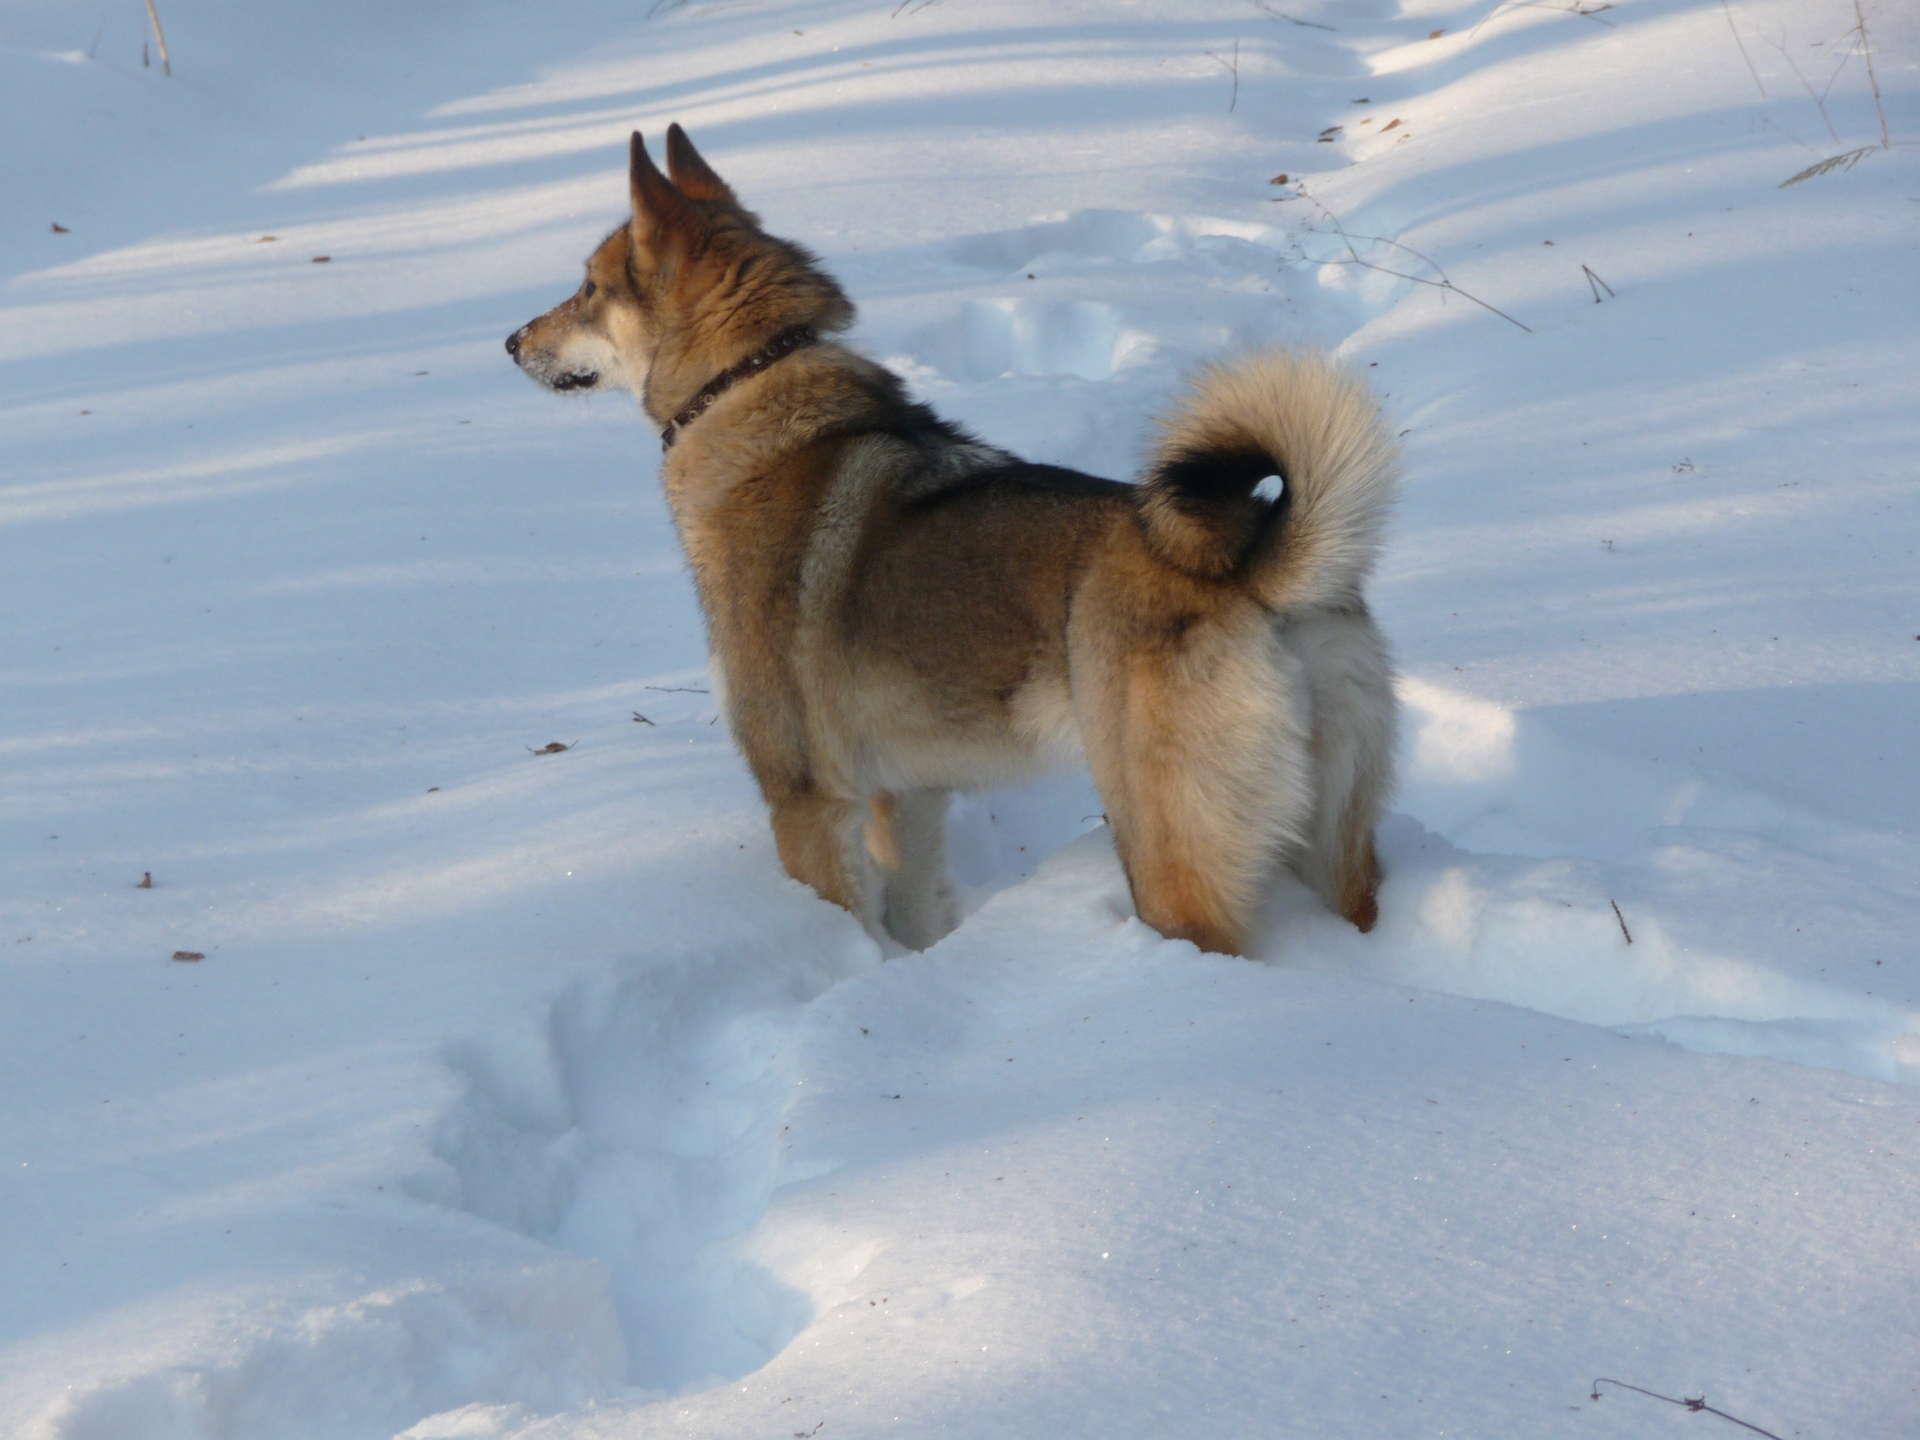 Западно-сибирская лайка: история, описание породы, стандарт, характер собаки, фото, цена